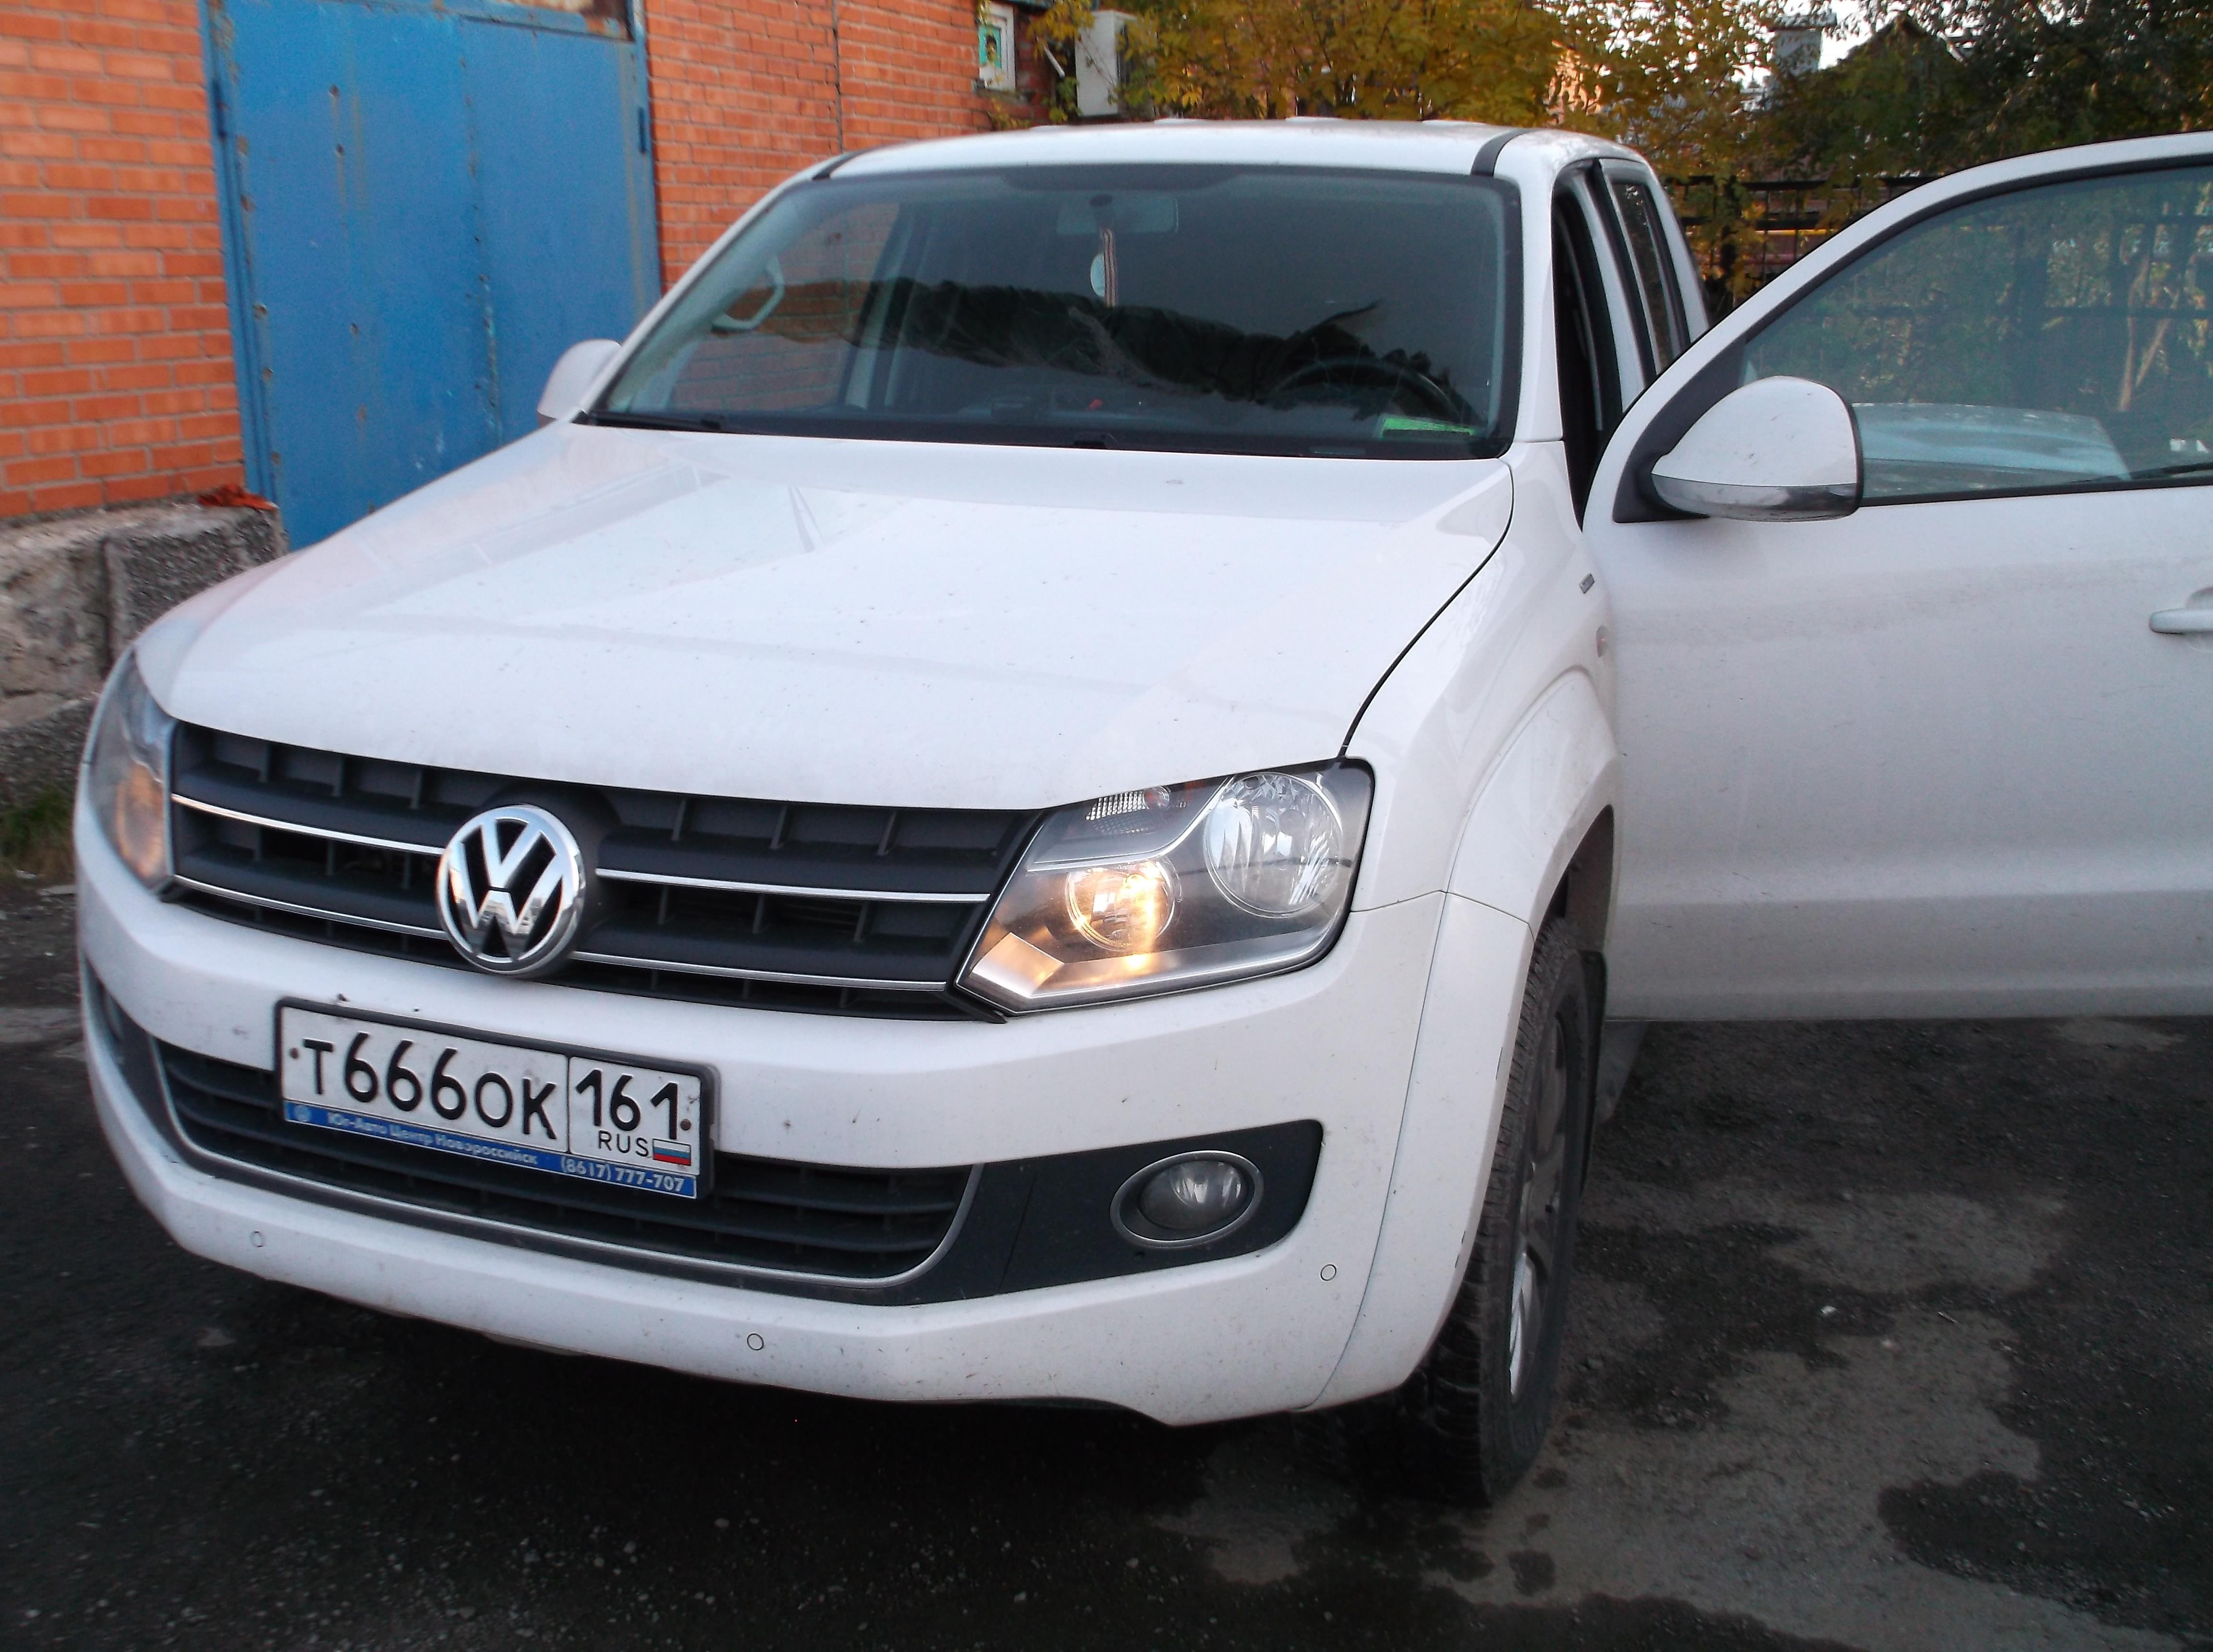 Удаление ЕГР на VW Amarok.